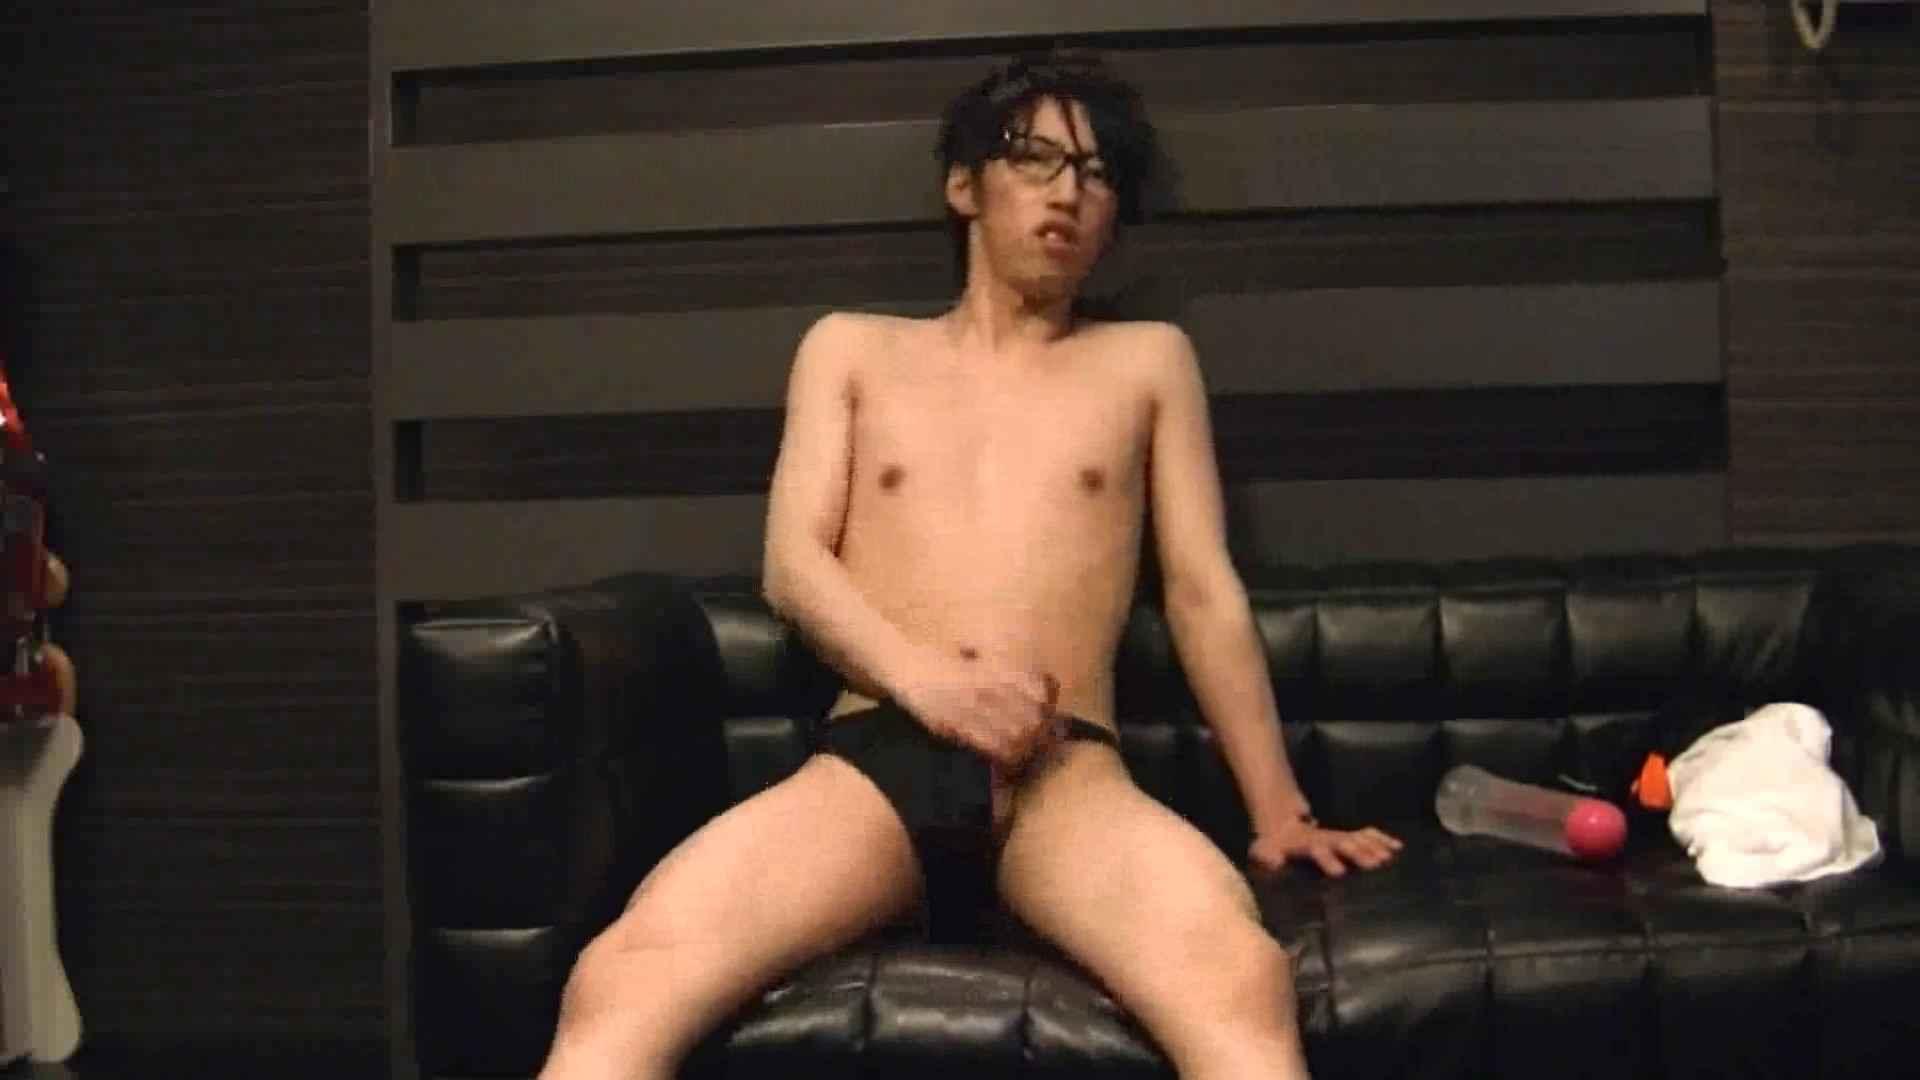 ONA見せカーニバル!! Vol3 男 ゲイ無料無修正画像 89枚 59